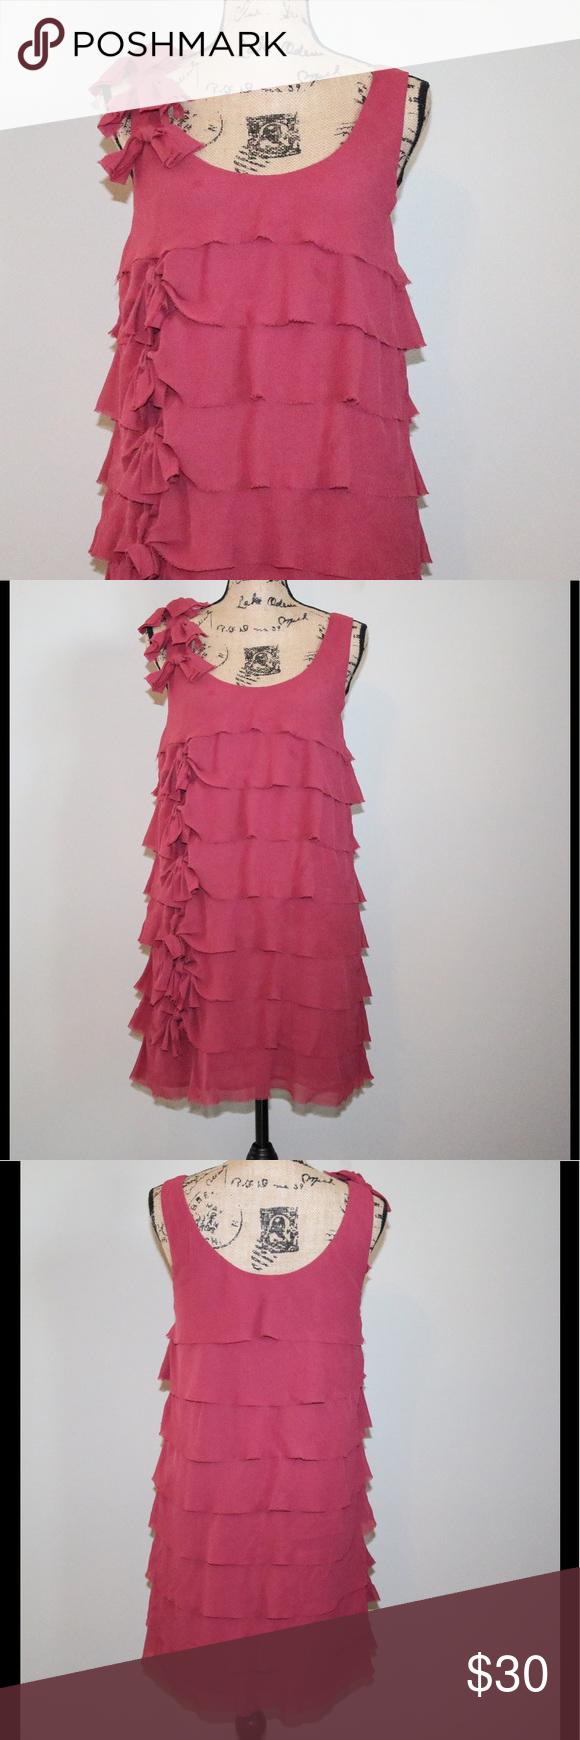 H&m dusty pink dress  H u M dusty rose ruffled dress sz   Pinterest  Dusty rose Ruffle